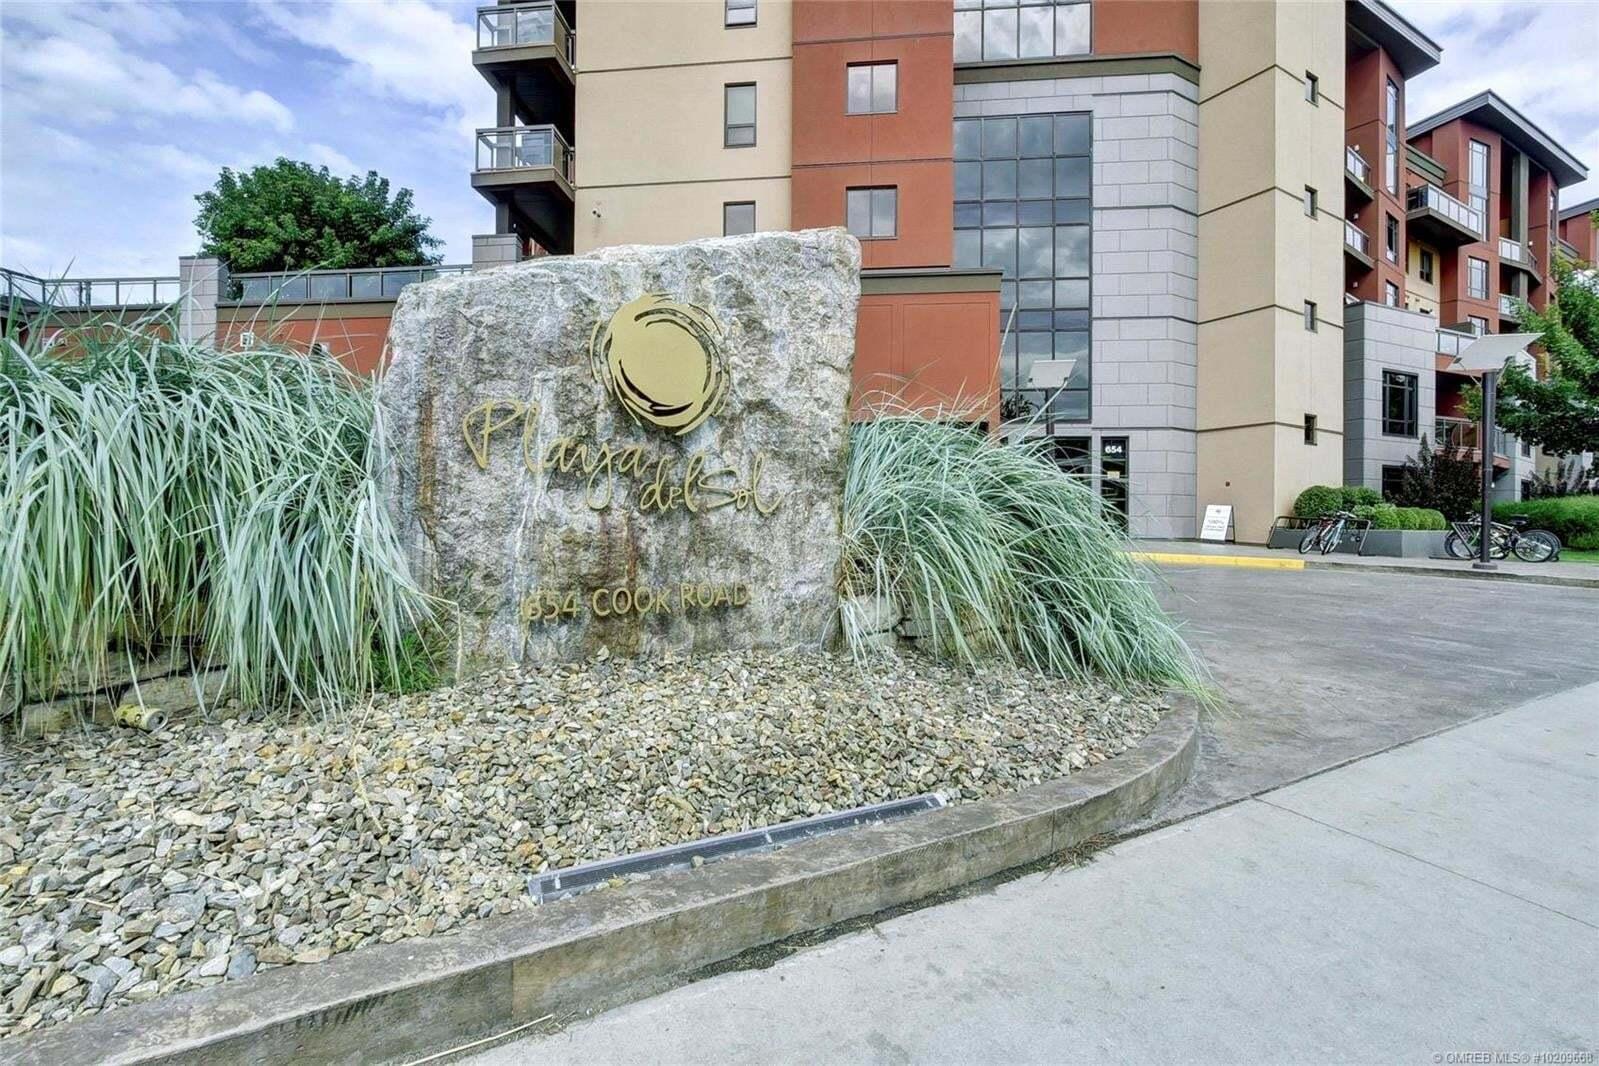 Condo for sale at 654 Cook Rd Unit 134 Kelowna British Columbia - MLS: 10209668